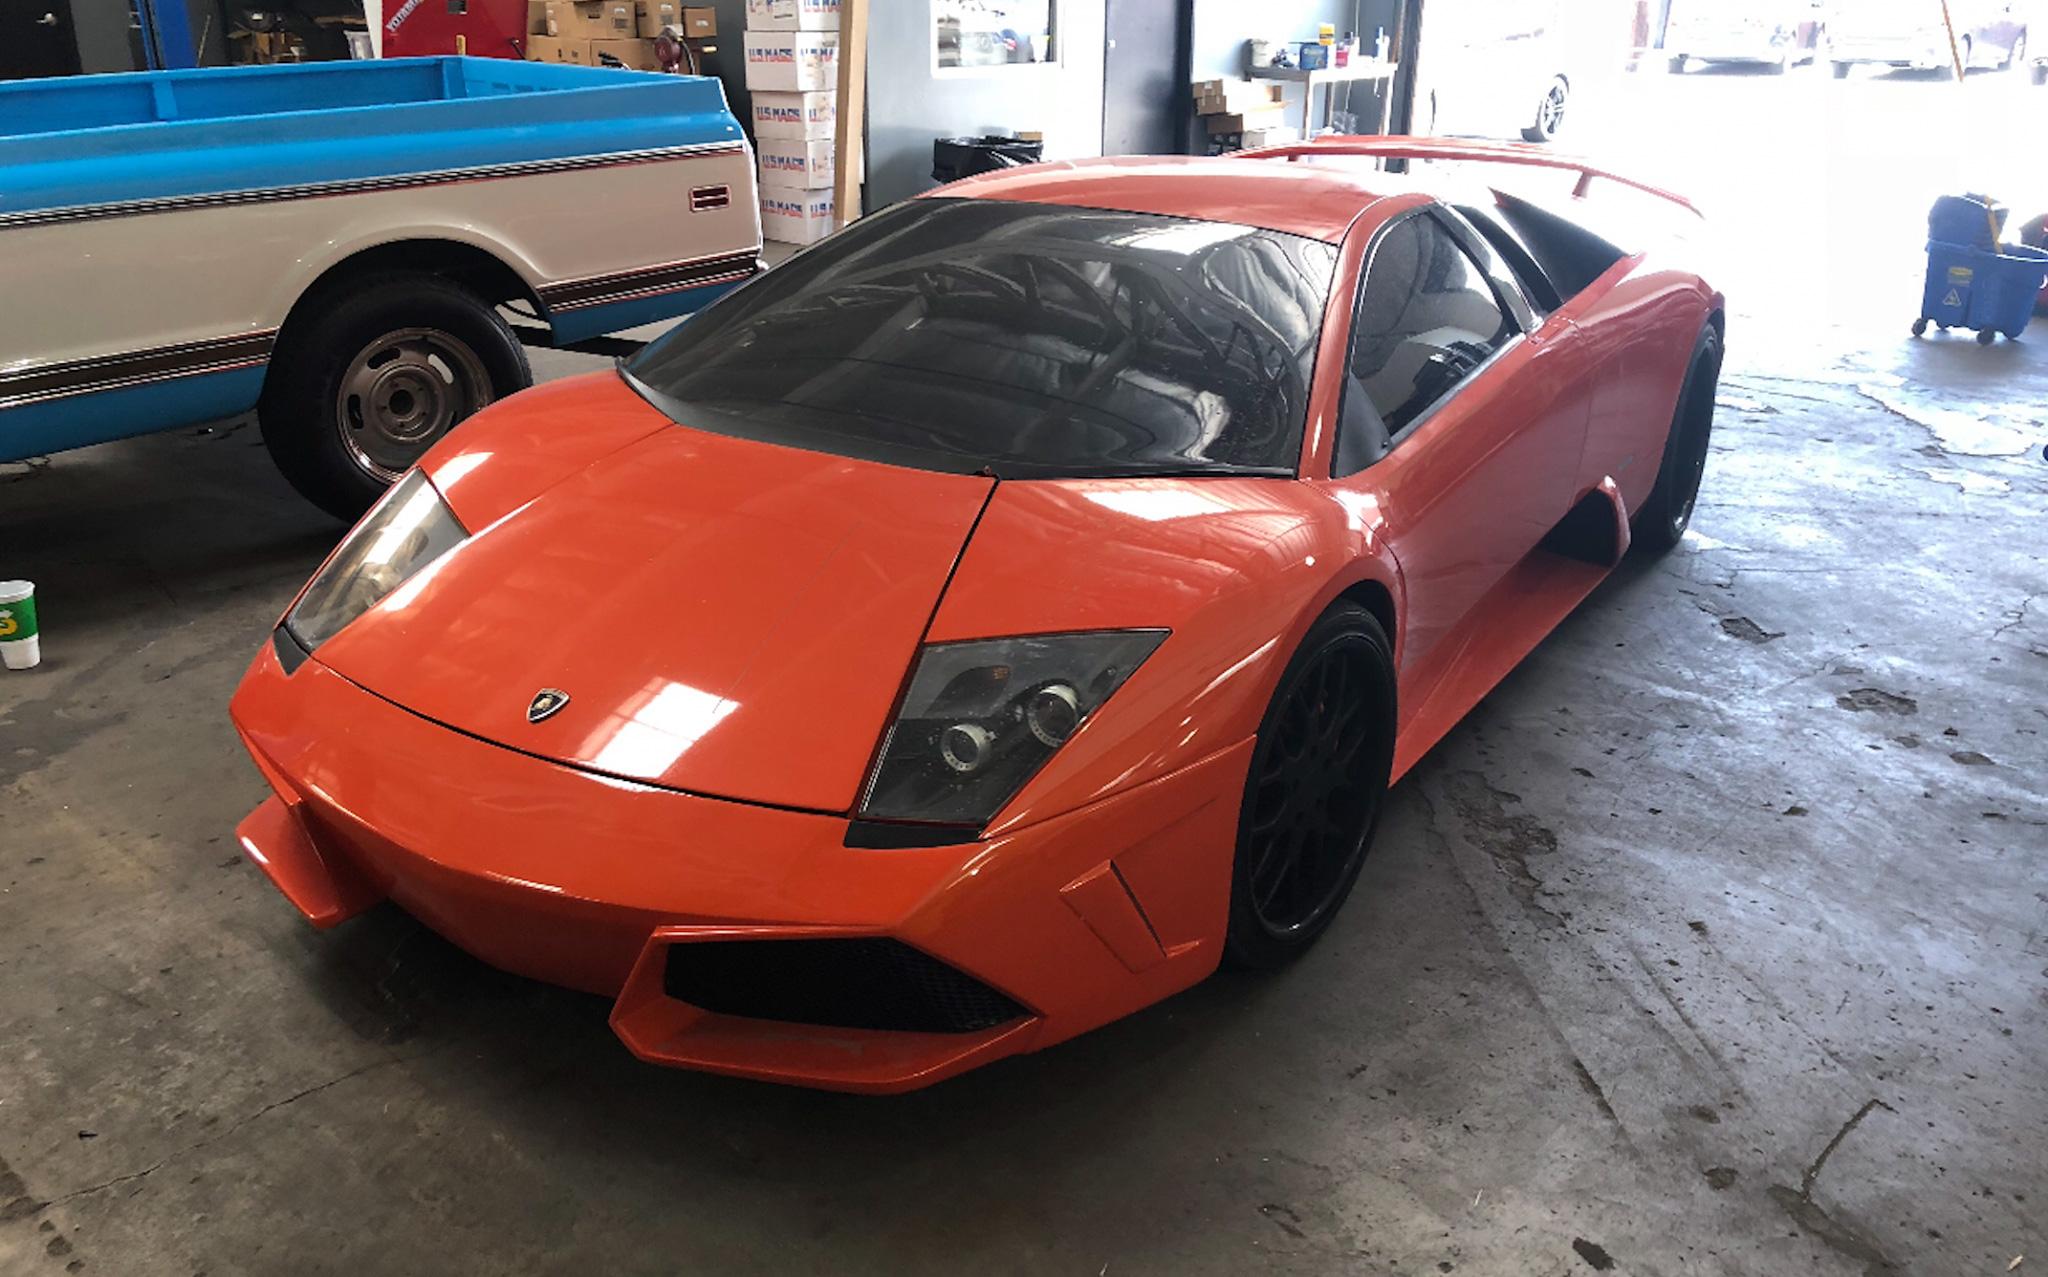 Lamborghini Murcielago front 3/4